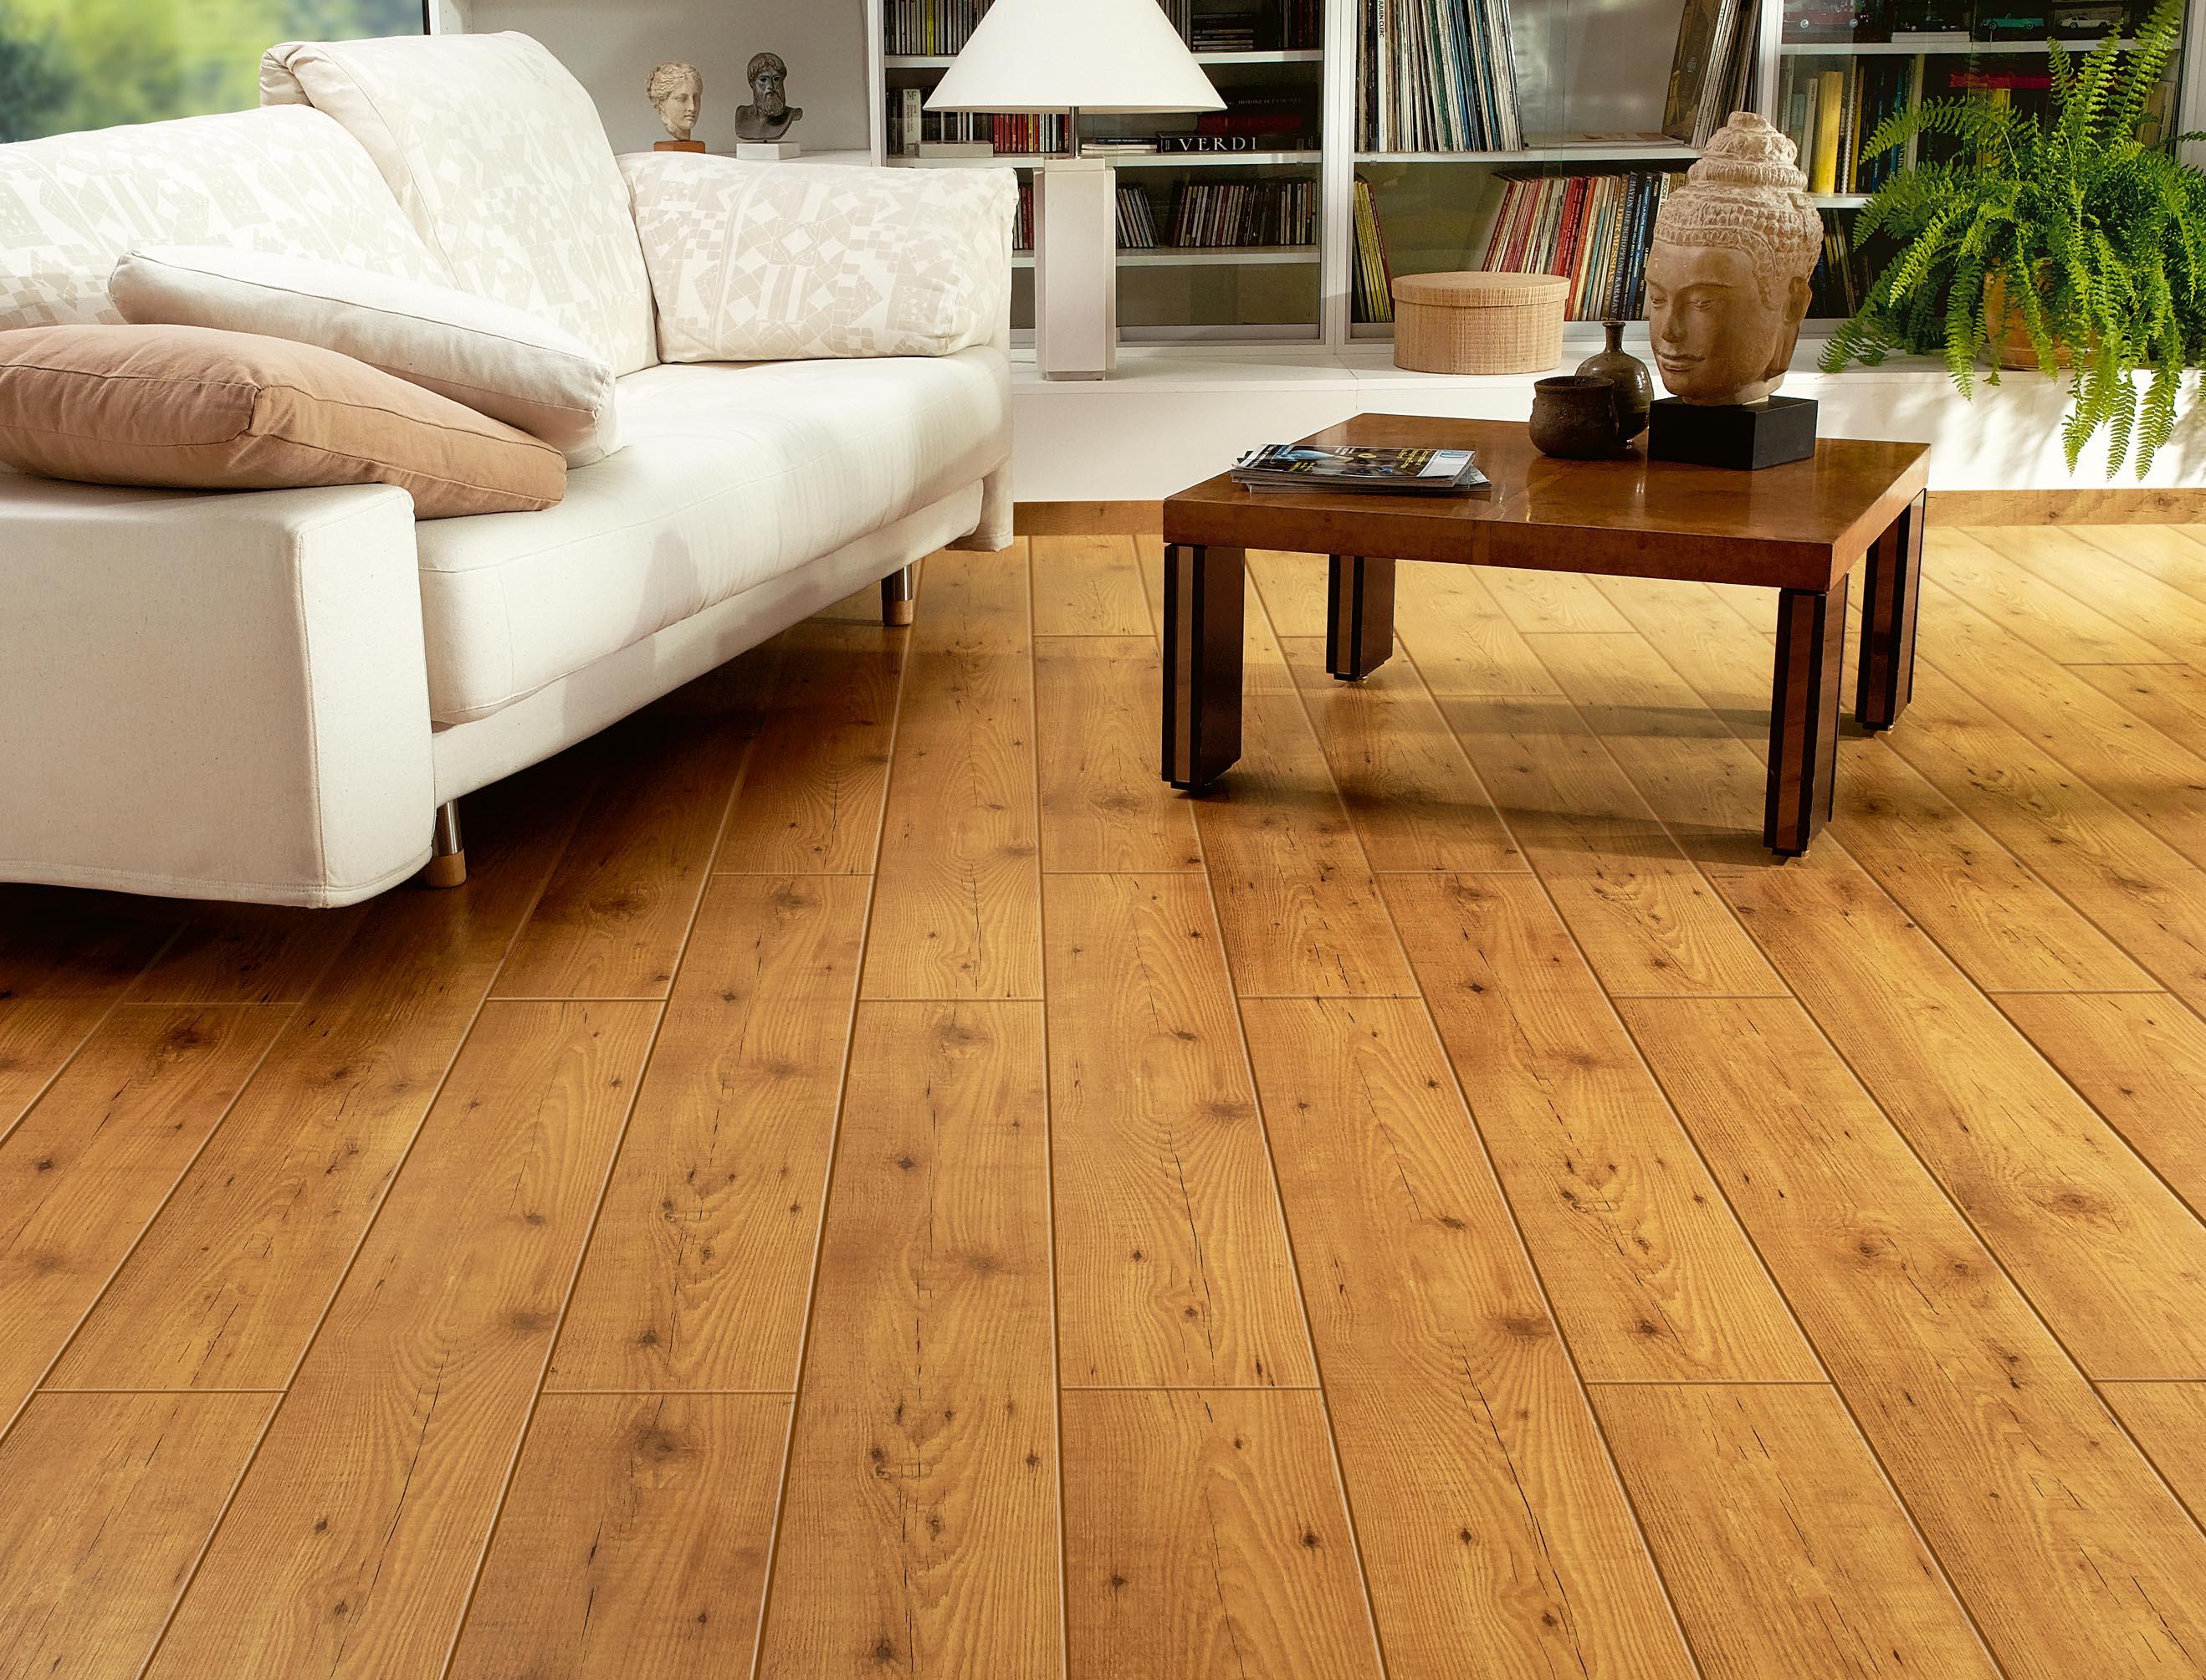 wooden flooring microsite OTGQTWI